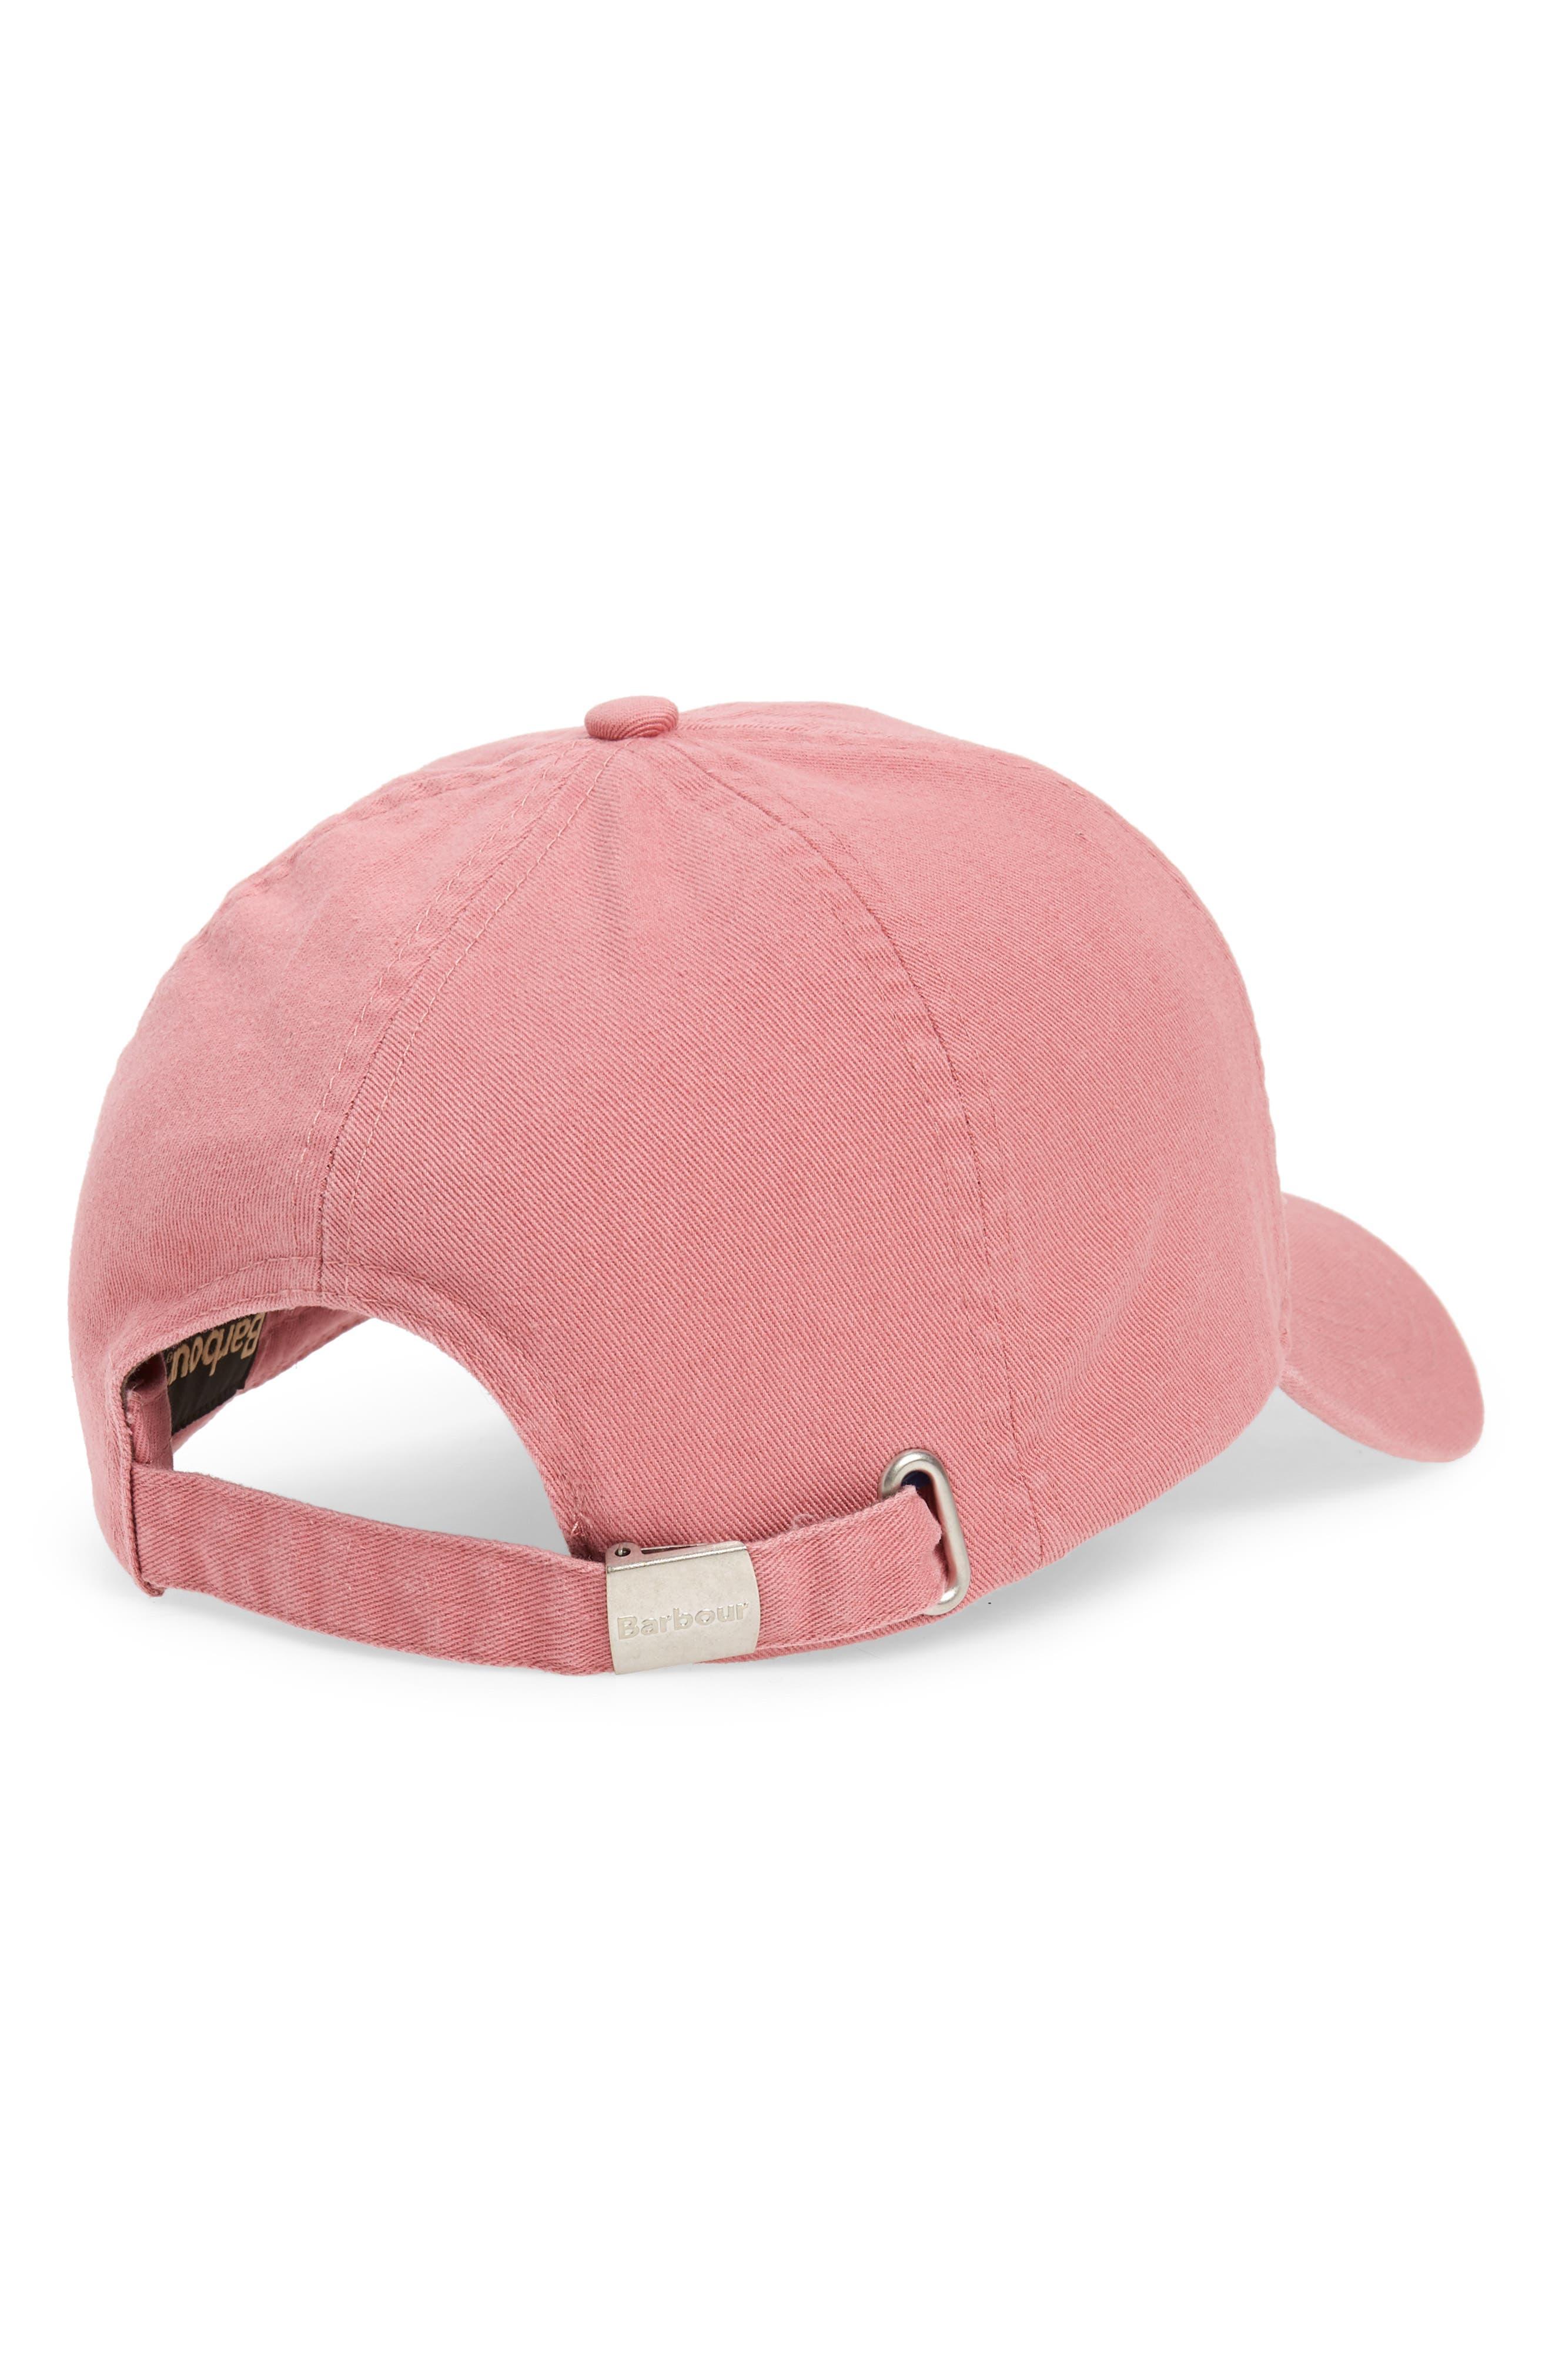 22a15e5aeb6 Baseball Hats for Men   Dad Hats